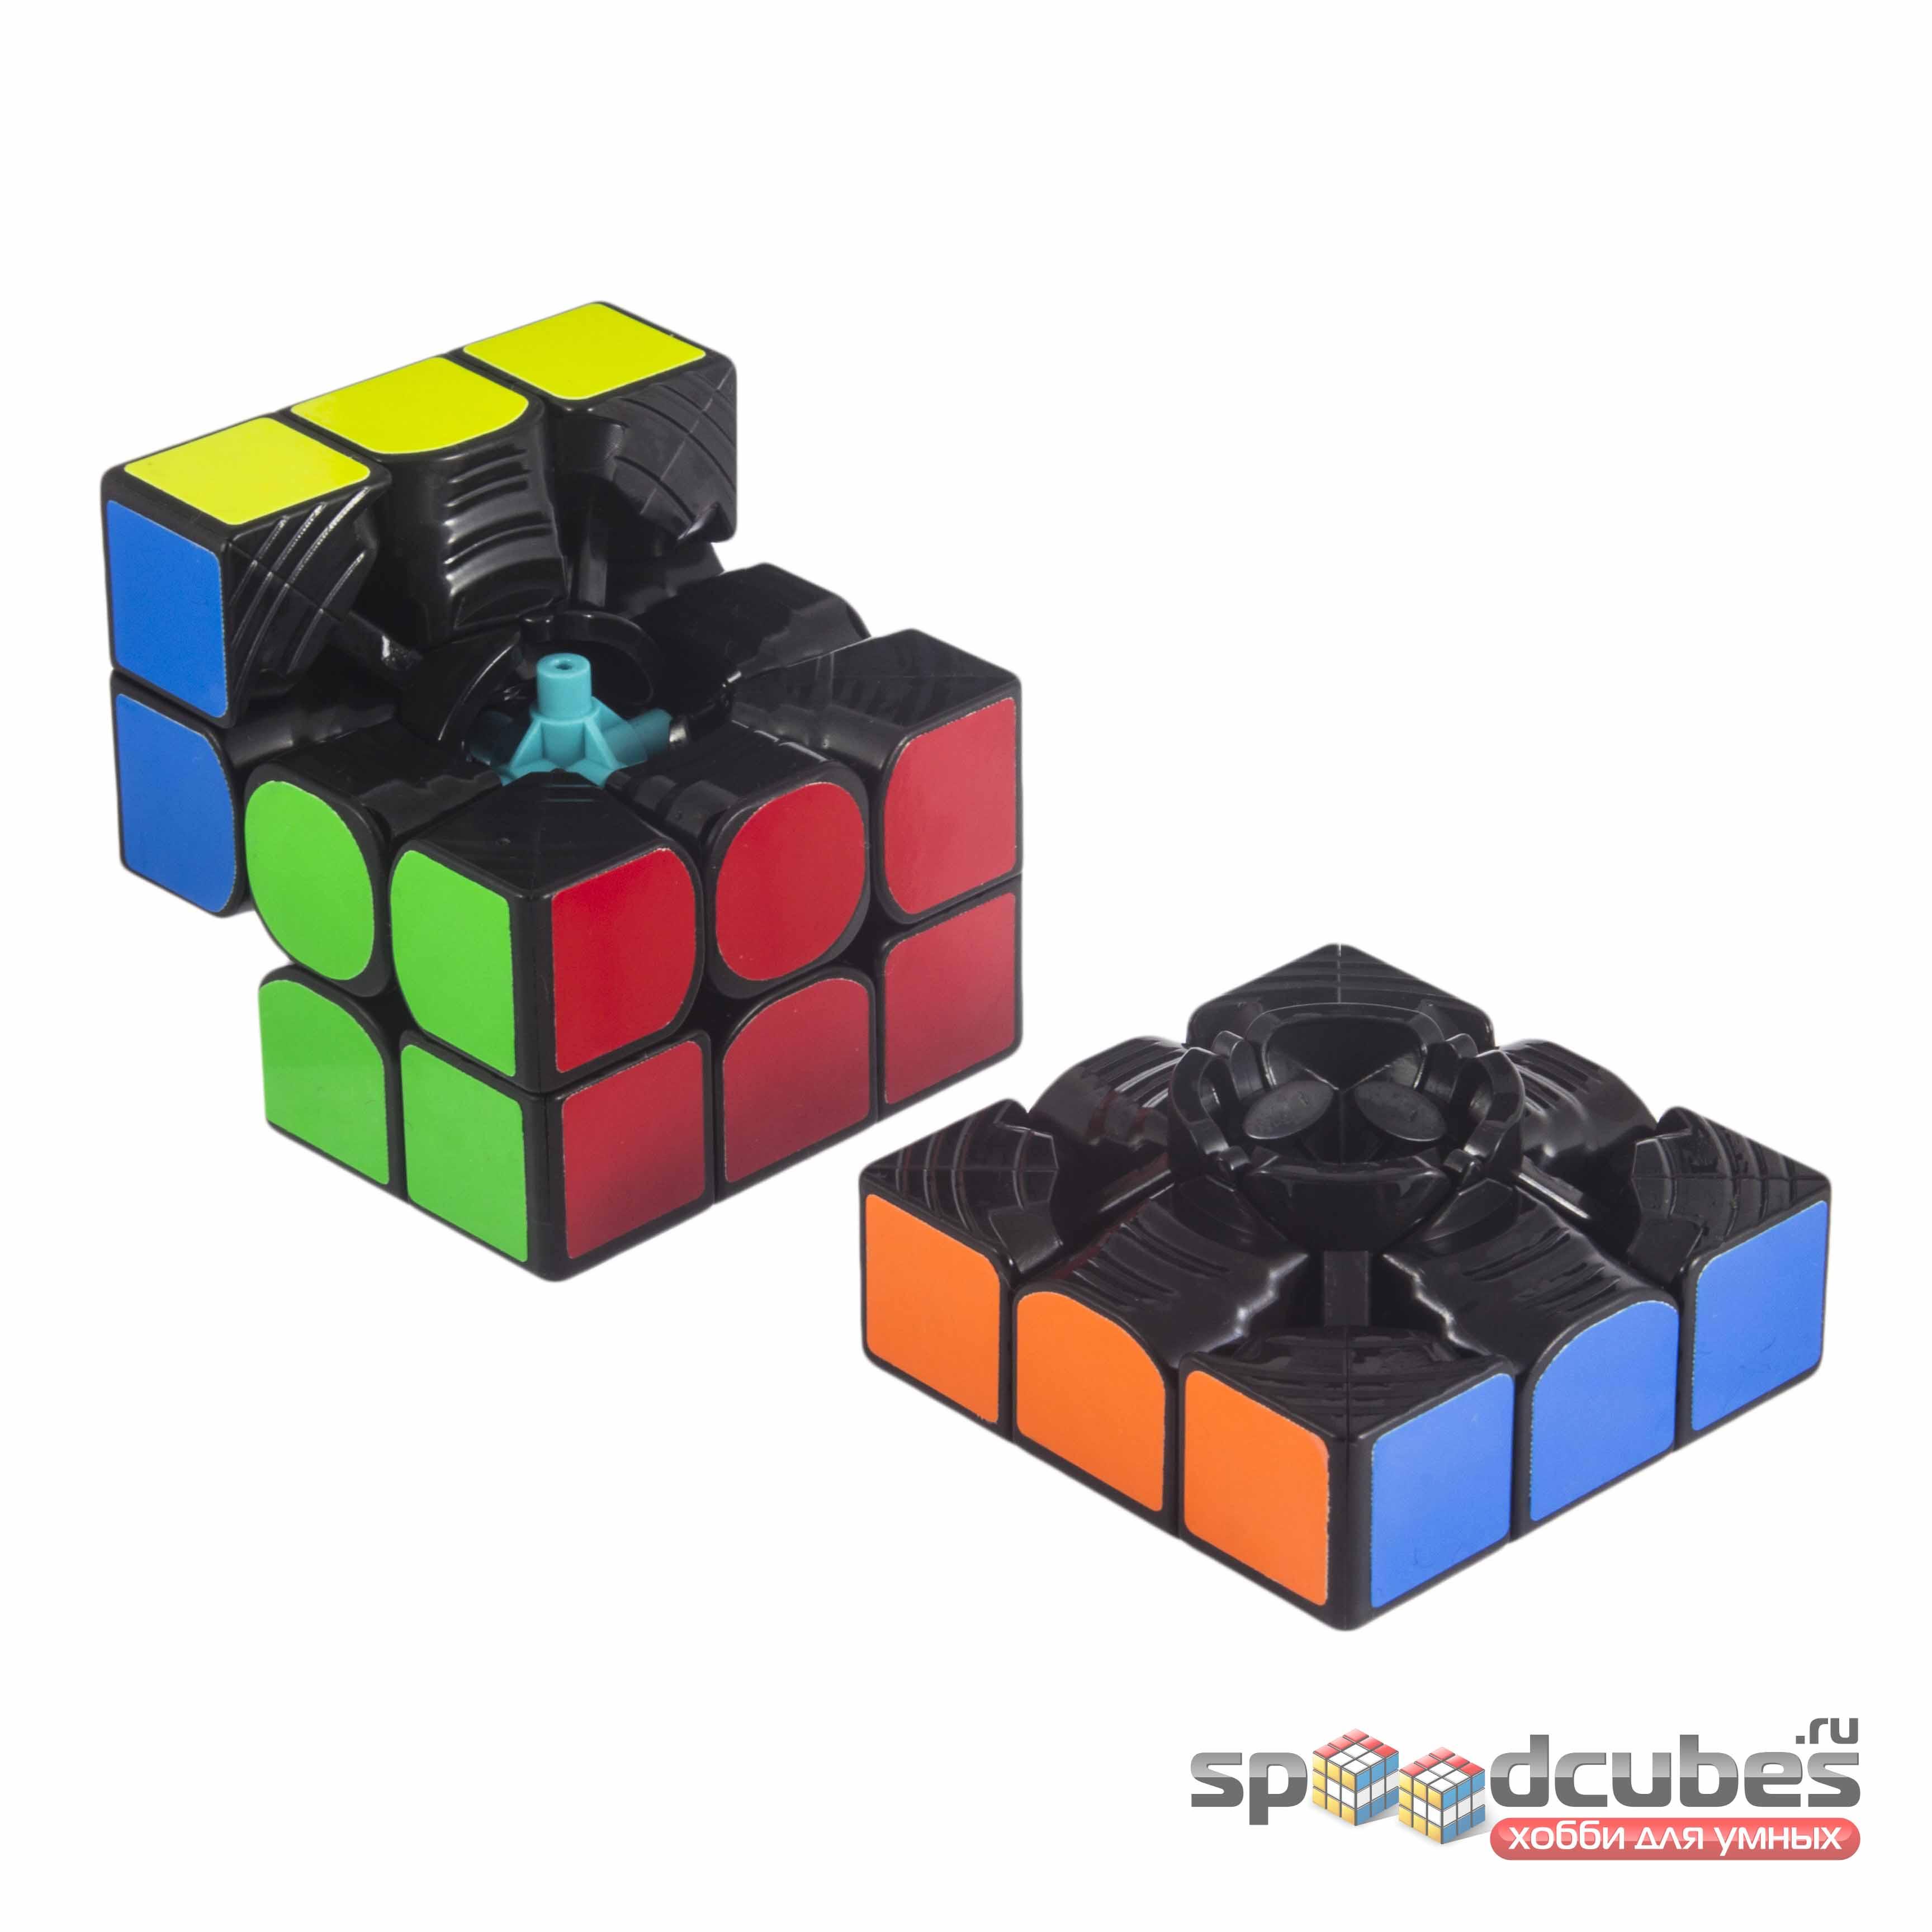 Yuxin 3x3x3 Little Magic Black 4